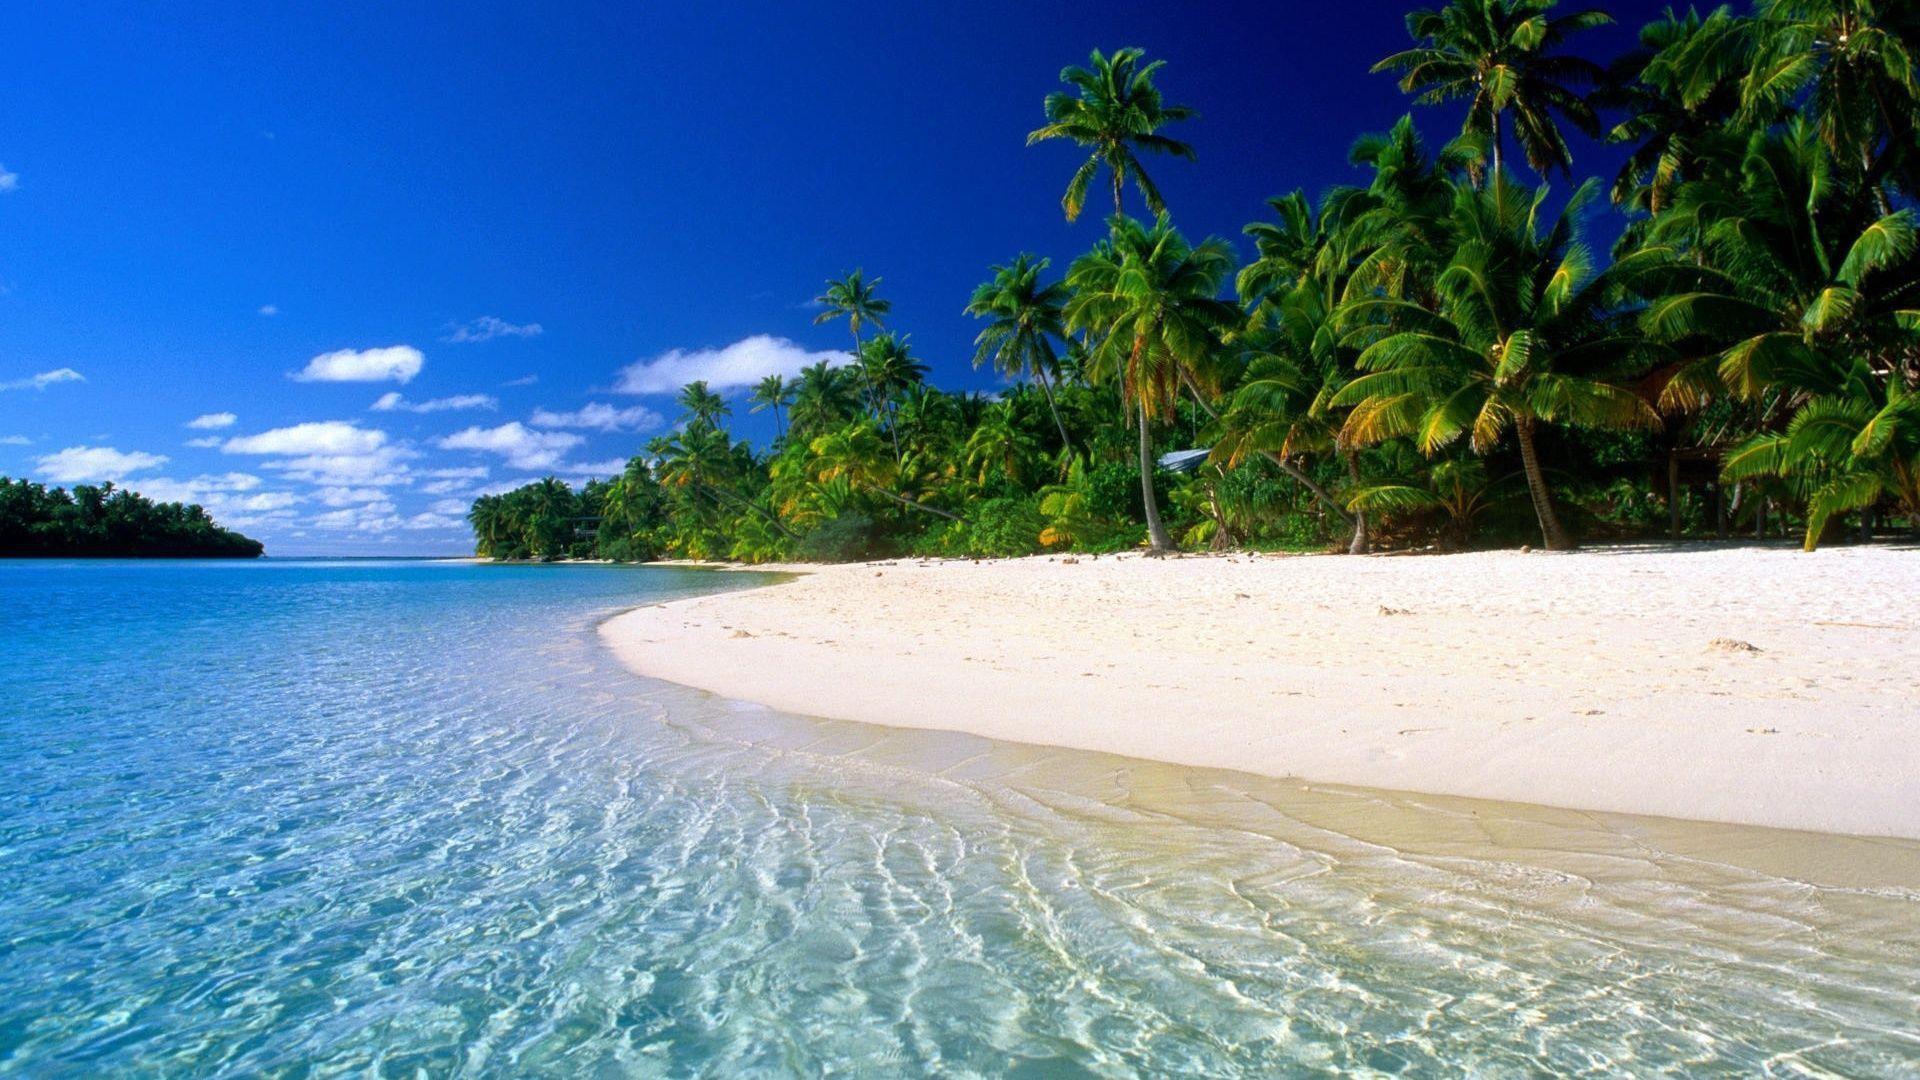 Hawaii Beach #9